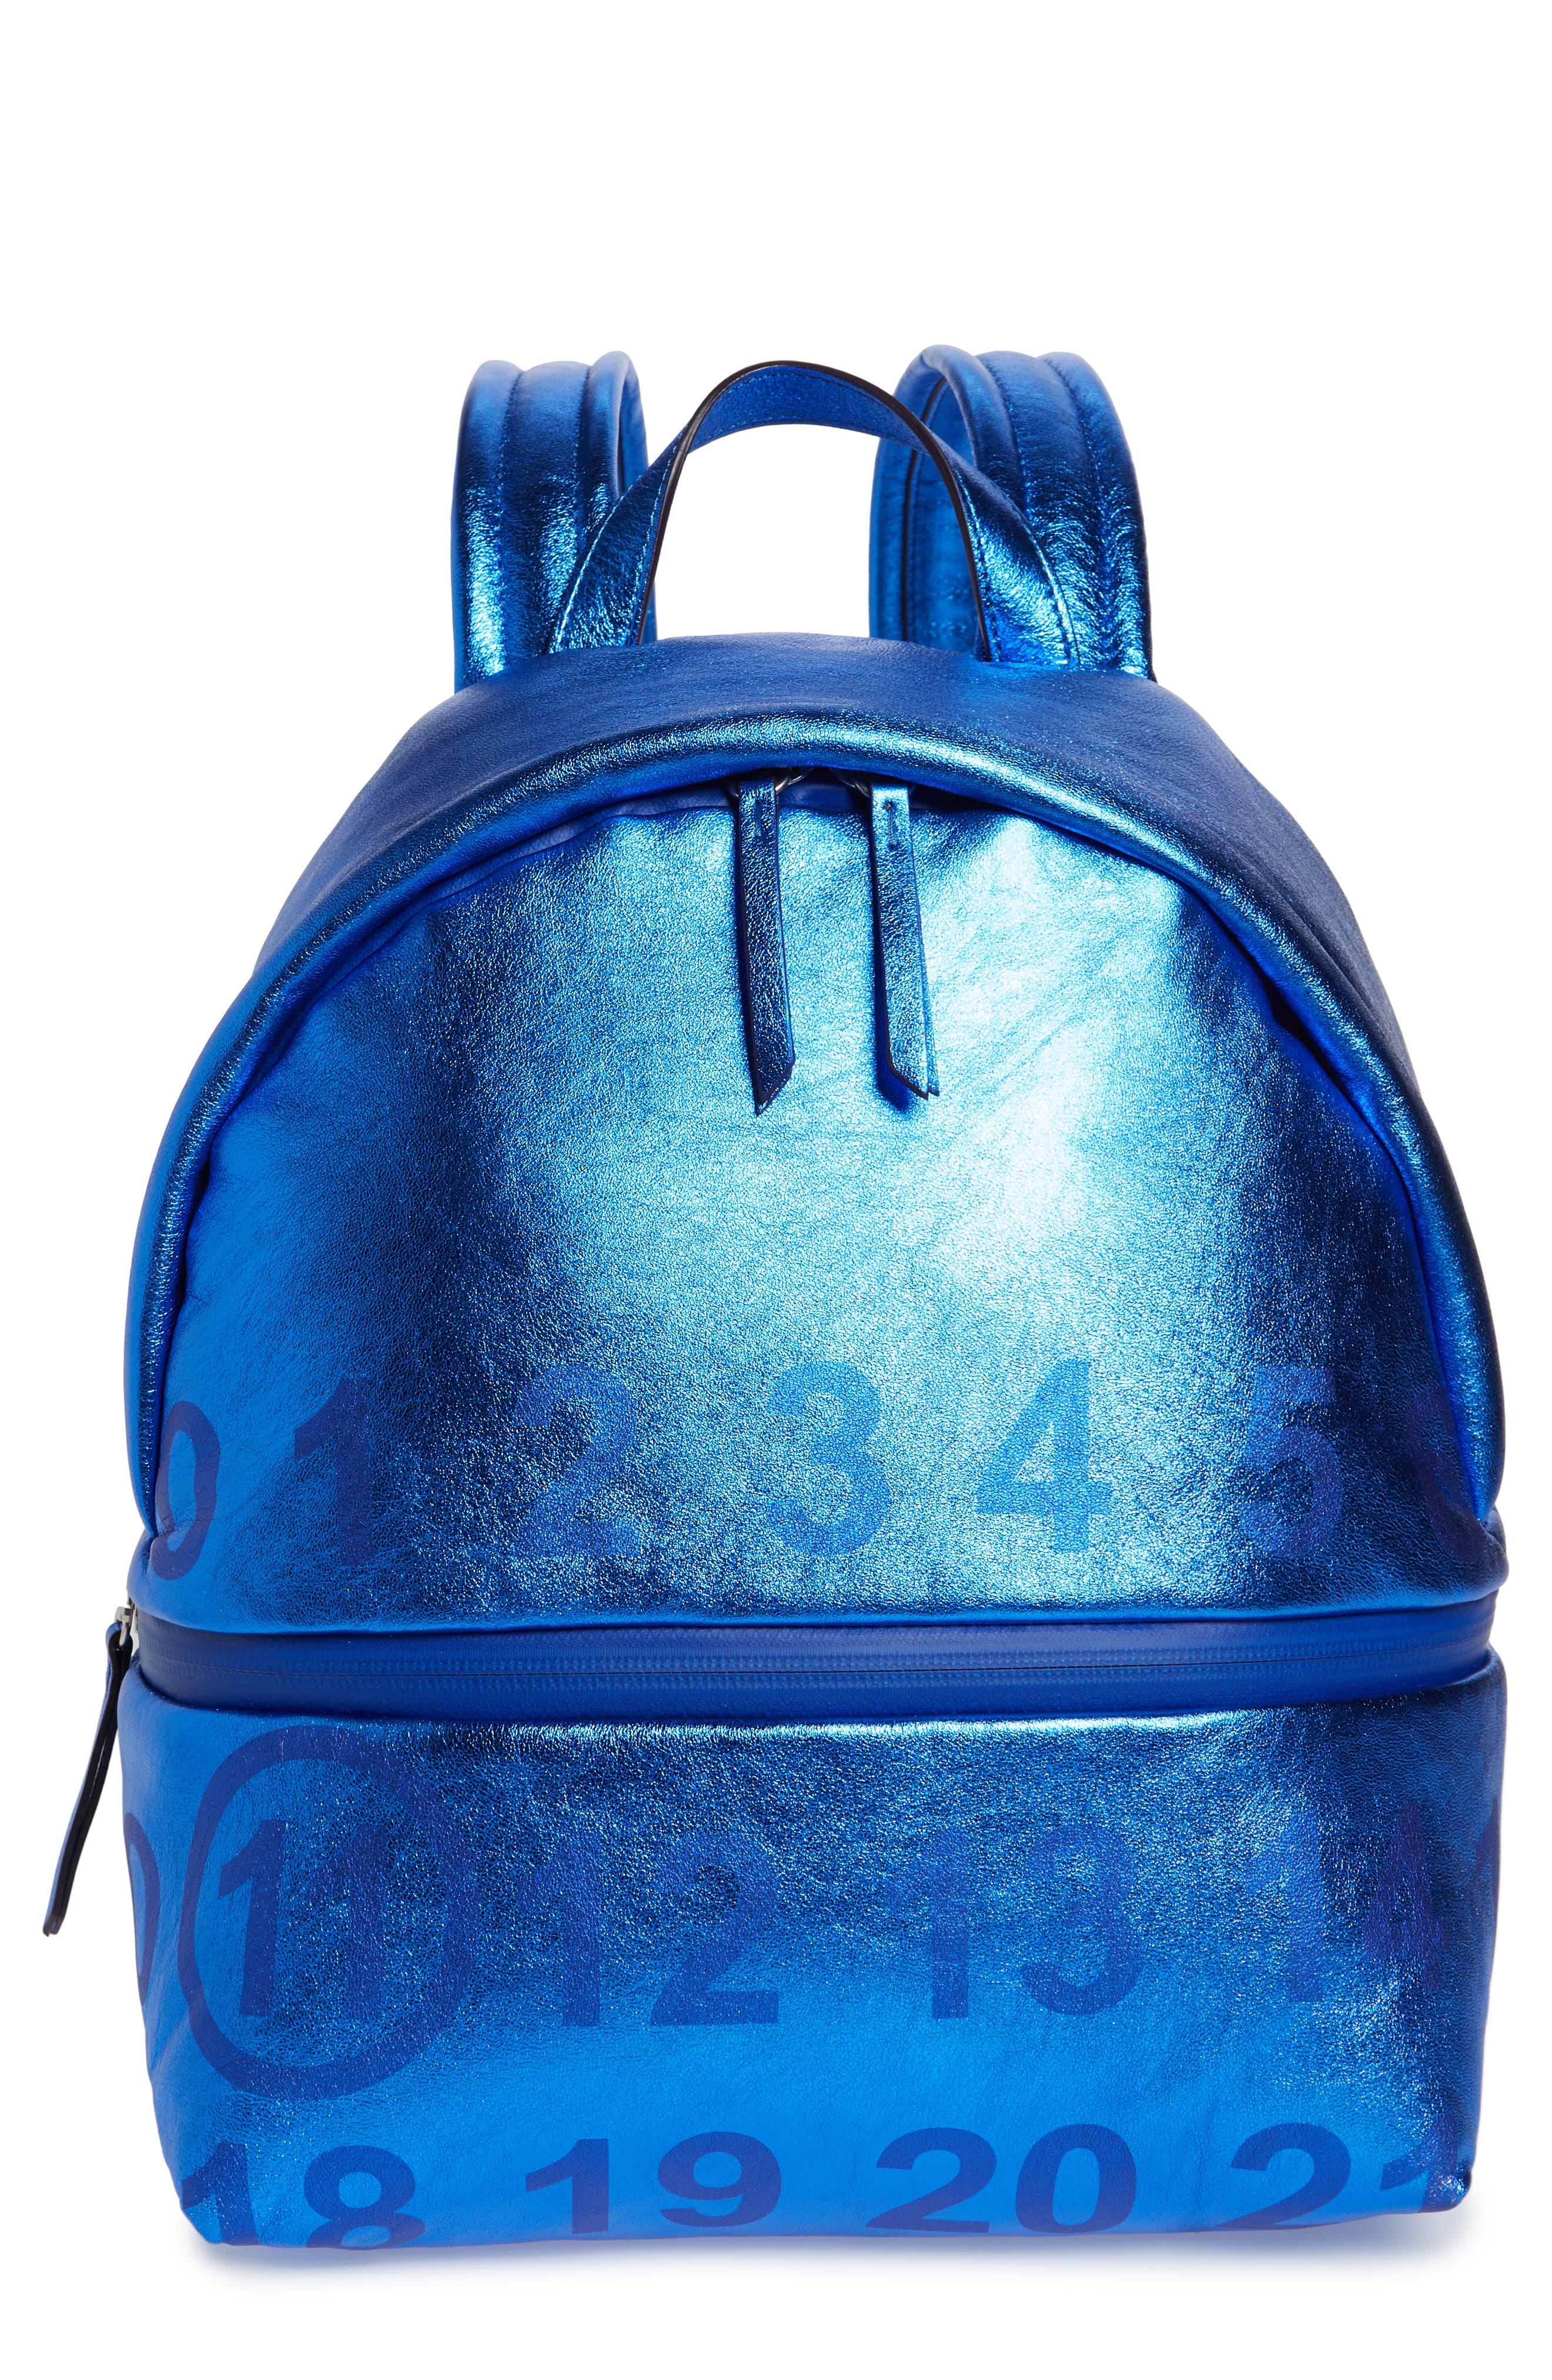 MAISON MARGIELA Medium Number Print Backpack, Main, color, DAZZLING BLUE